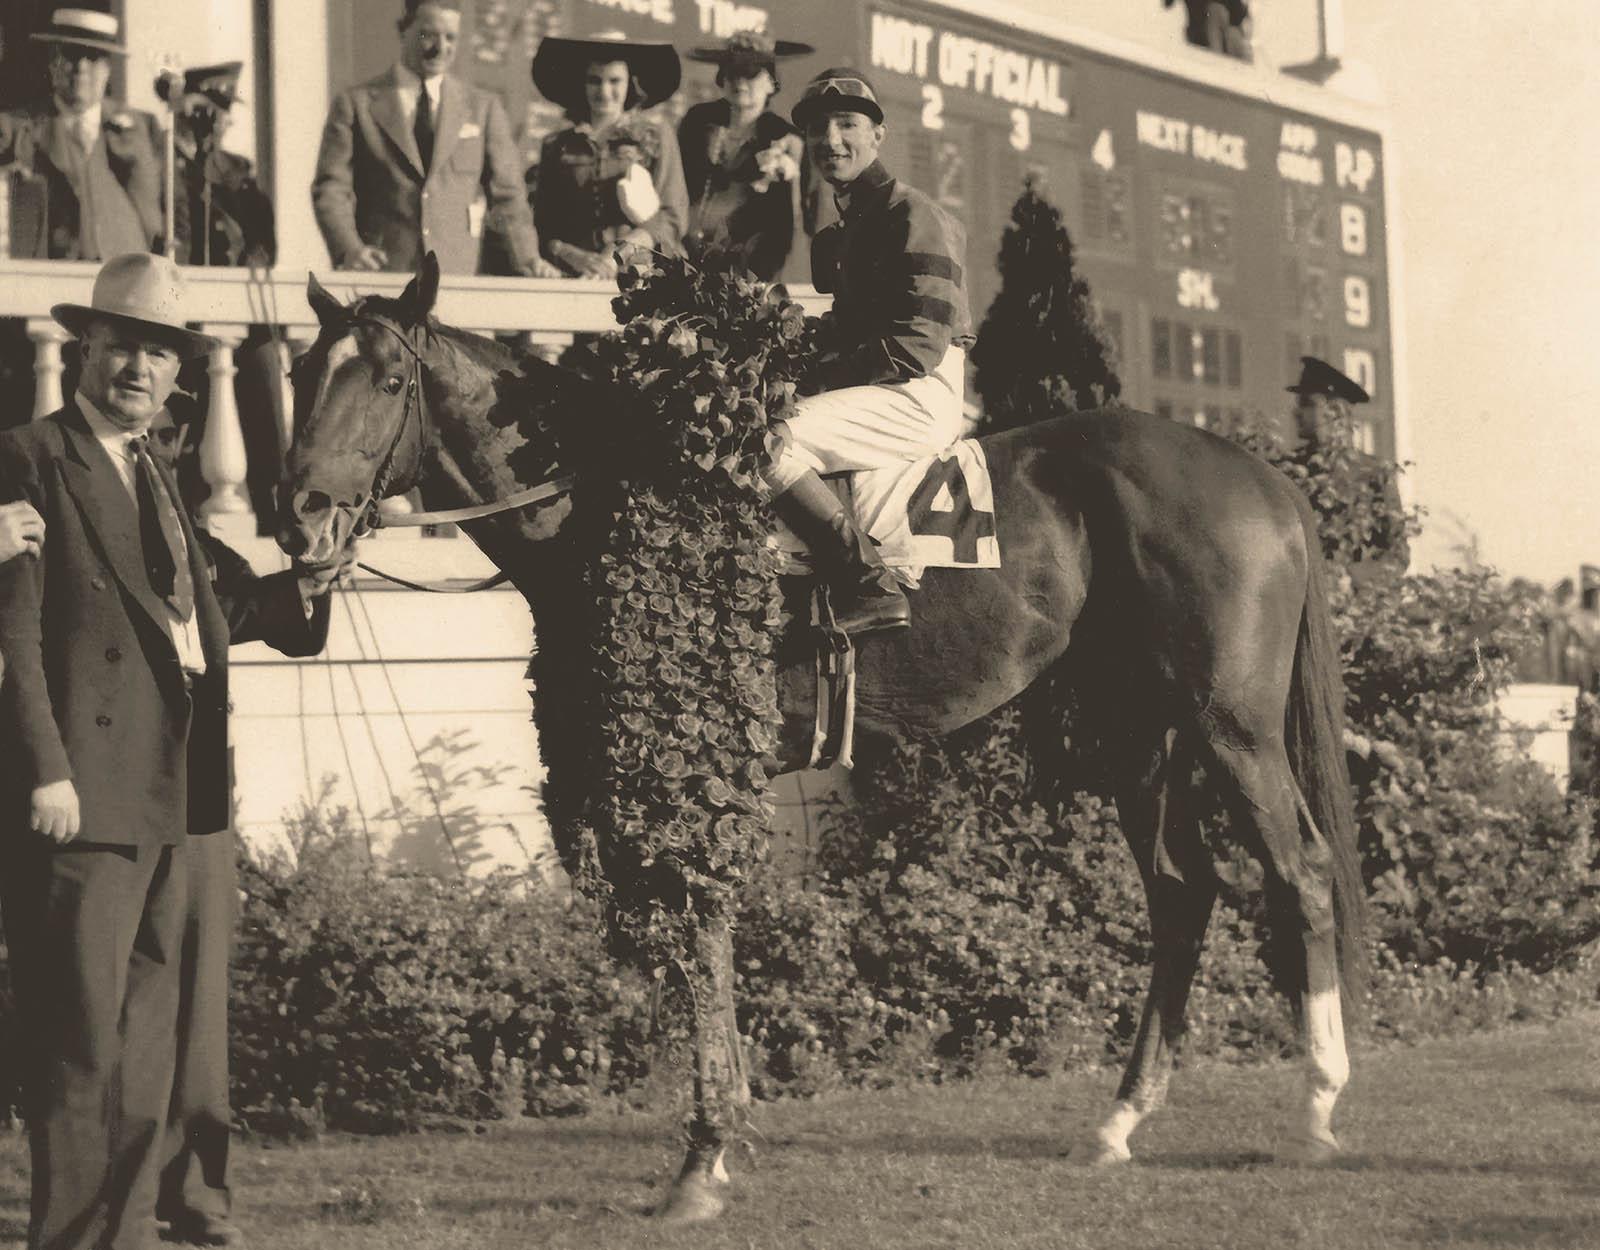 Whirlaway-1941 Winners Circle KYDerby - @Calumet Farm Bourbon Whiskey